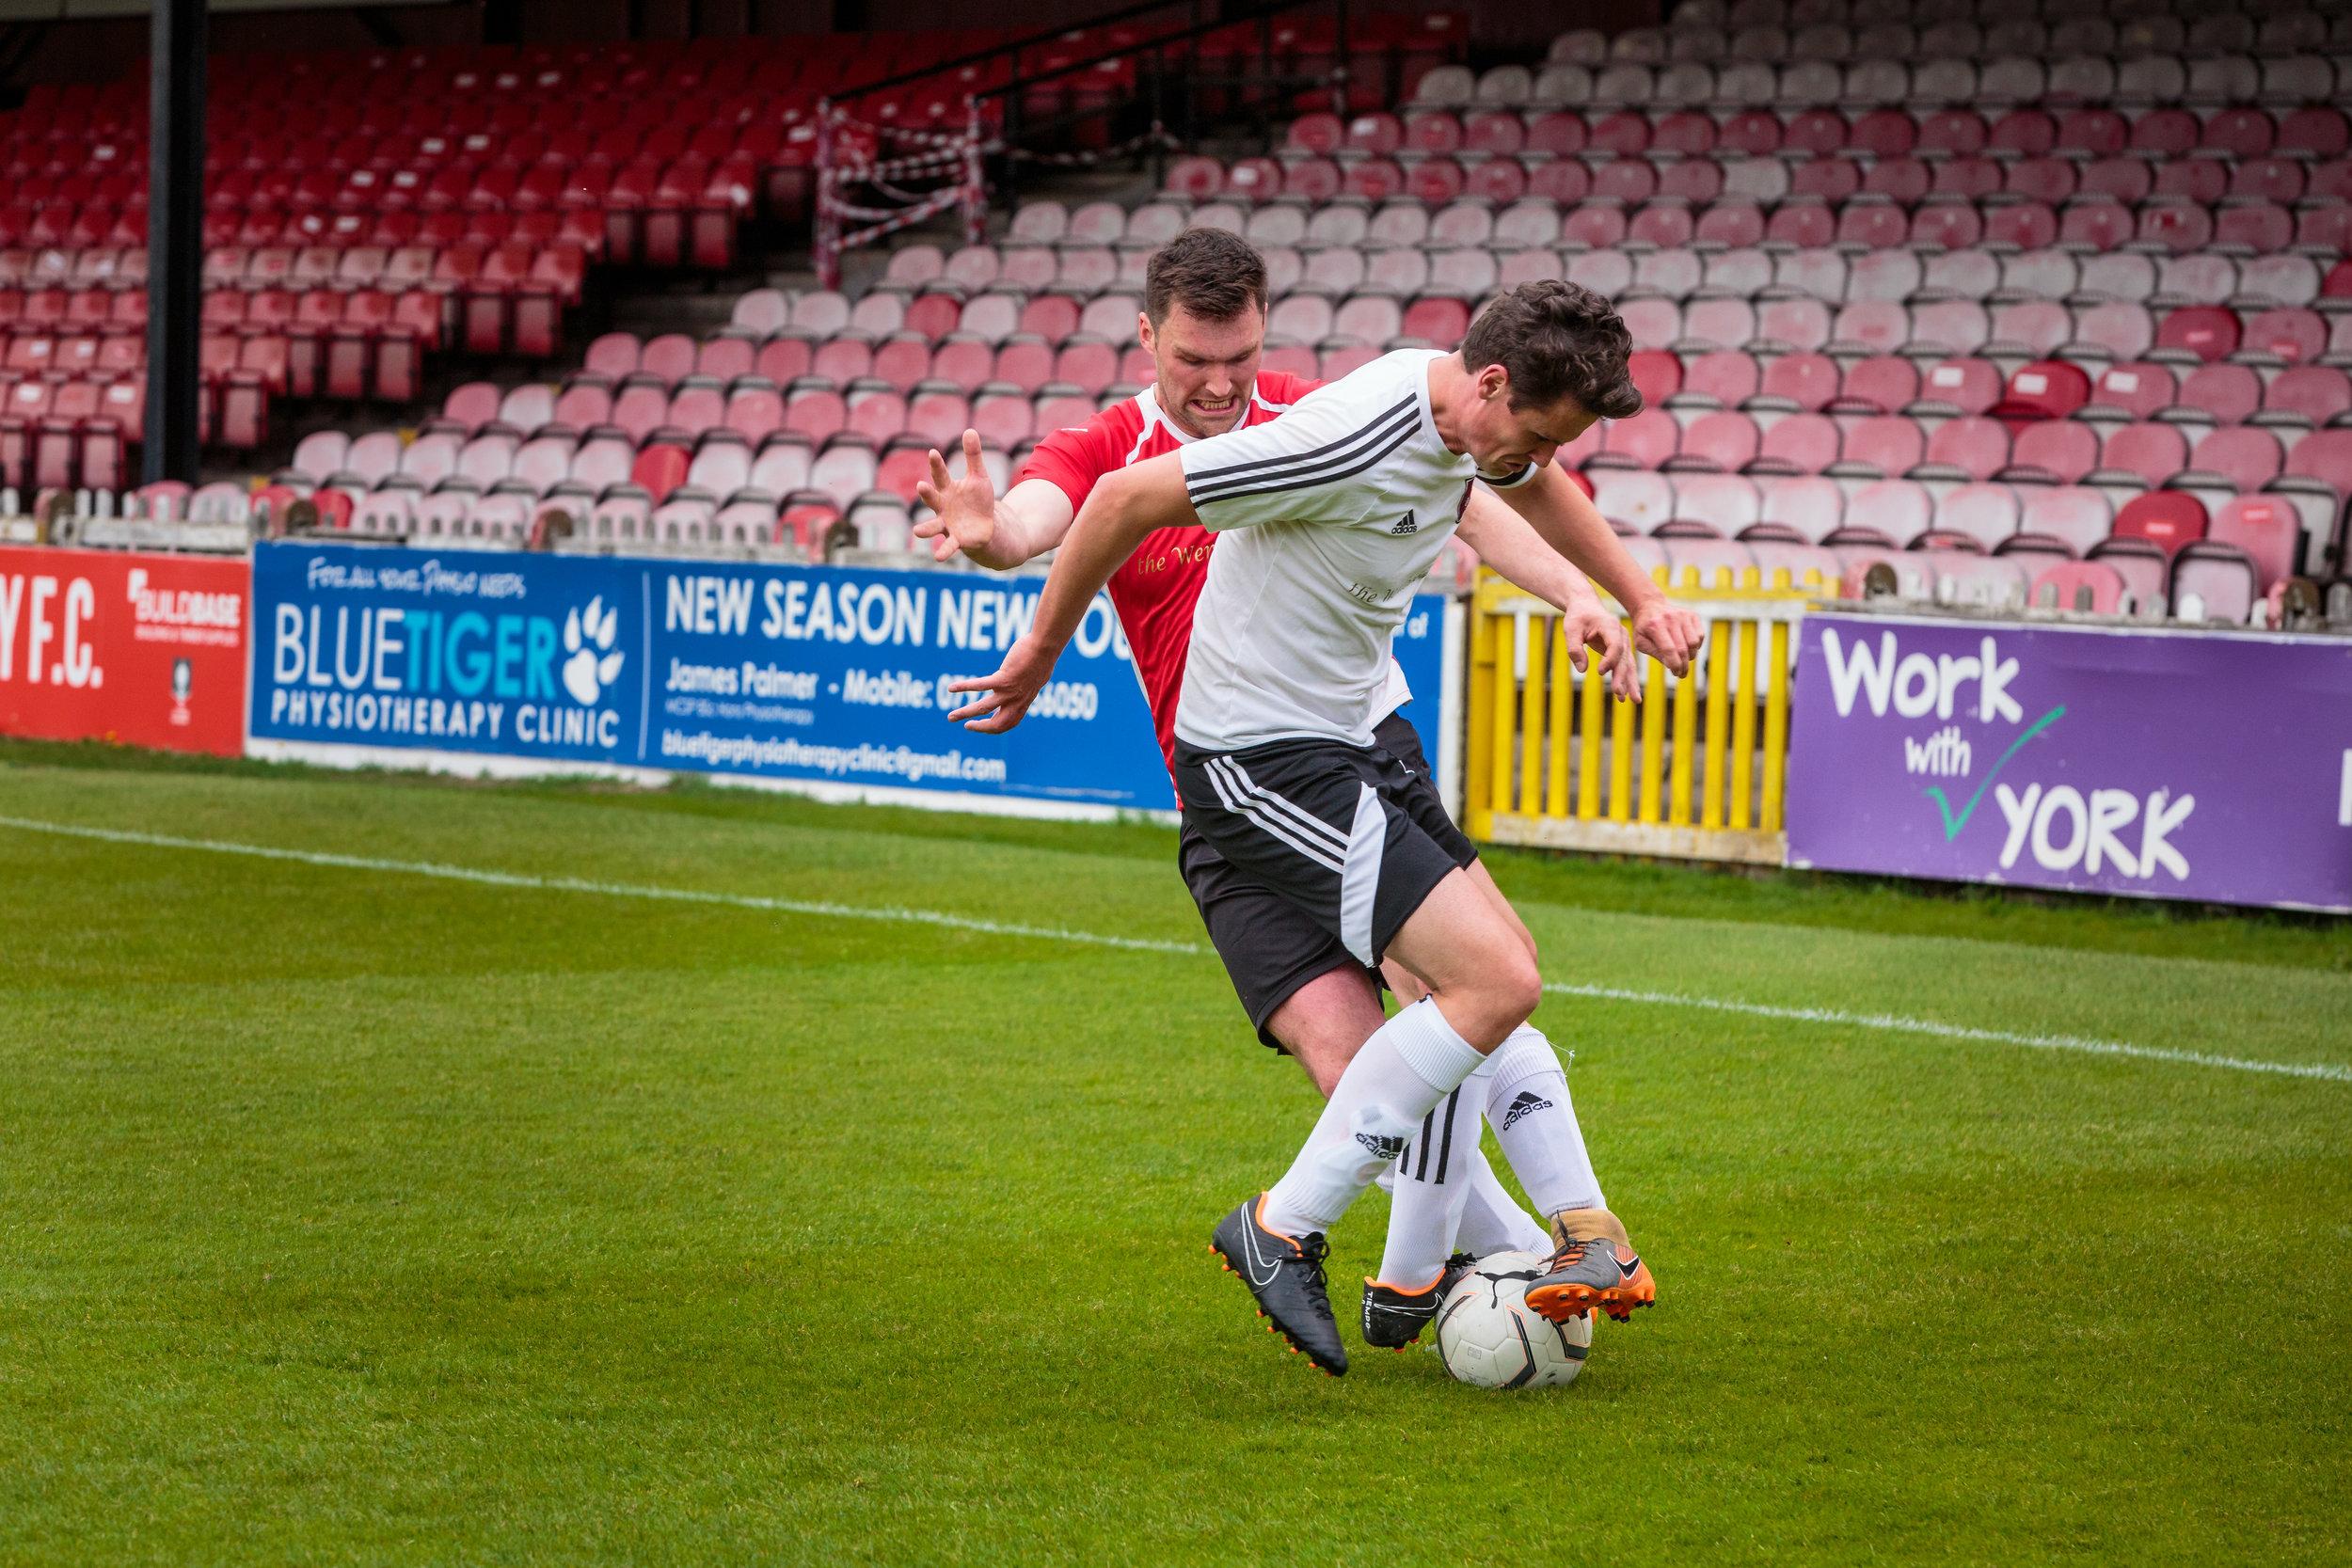 Footballlers for Wheldrake Football Club